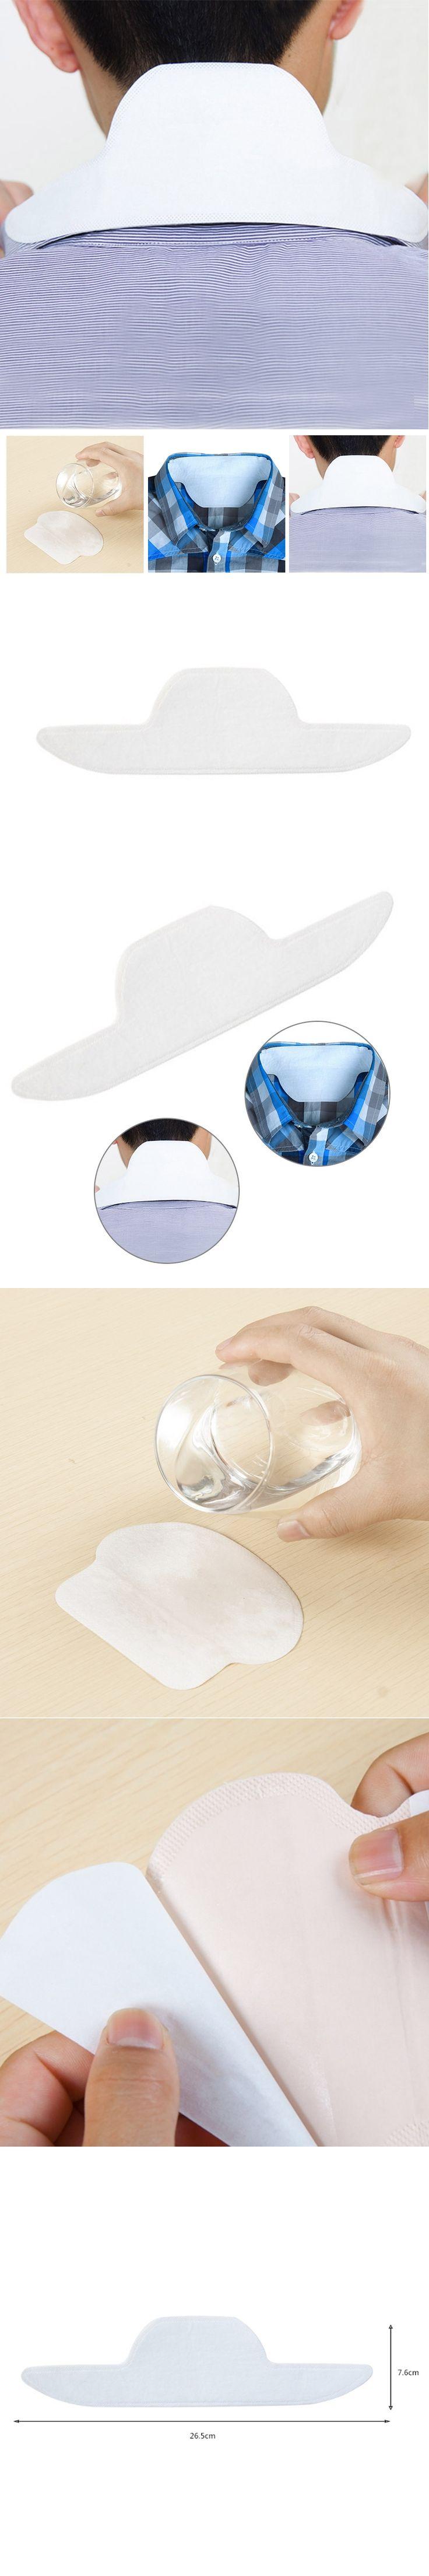 ELECOOL 8PCS Disposable Collar Sweat Pads Adhesive Guard Sheet Liner Dress Shield Sweating Man Neck Tie Antiperspirant Deodorant